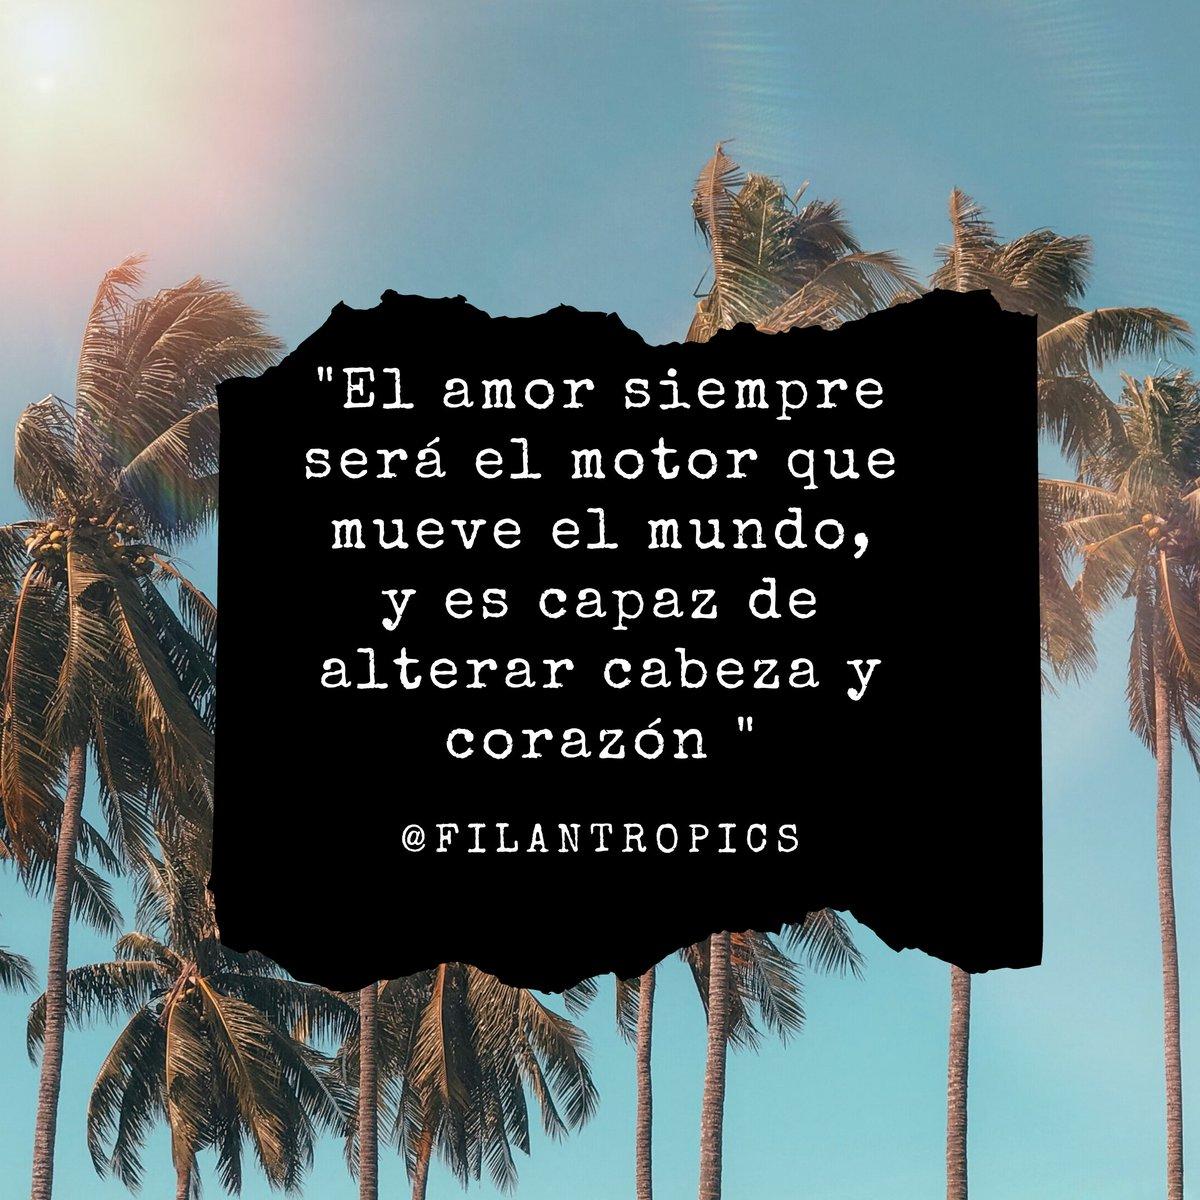 """𝑬𝒍 𝒂𝒎𝒐𝒓 𝒔𝒊𝒆𝒎𝒑𝒓𝒆 𝒔𝒆𝒓𝒂́ 𝒆𝒍 𝒎𝒐𝒕𝒐𝒓 𝒒𝒖𝒆 𝒎𝒖𝒆𝒗𝒆 𝒆𝒍 𝒎𝒖𝒏𝒅𝒐, 𝒚 𝒆𝒔 𝒄𝒂𝒑𝒂𝒛 𝒅𝒆 𝒂𝒍𝒕𝒆𝒓𝒂𝒓 𝒄𝒂𝒃𝒆𝒛𝒂 𝒚 𝒄𝒐𝒓𝒂𝒛𝒐́𝒏 "" 🌴☀ #filantropics #love #instapics #pic #motivation #sunshine #photooftheday #picoftheday #estadomentalsano"